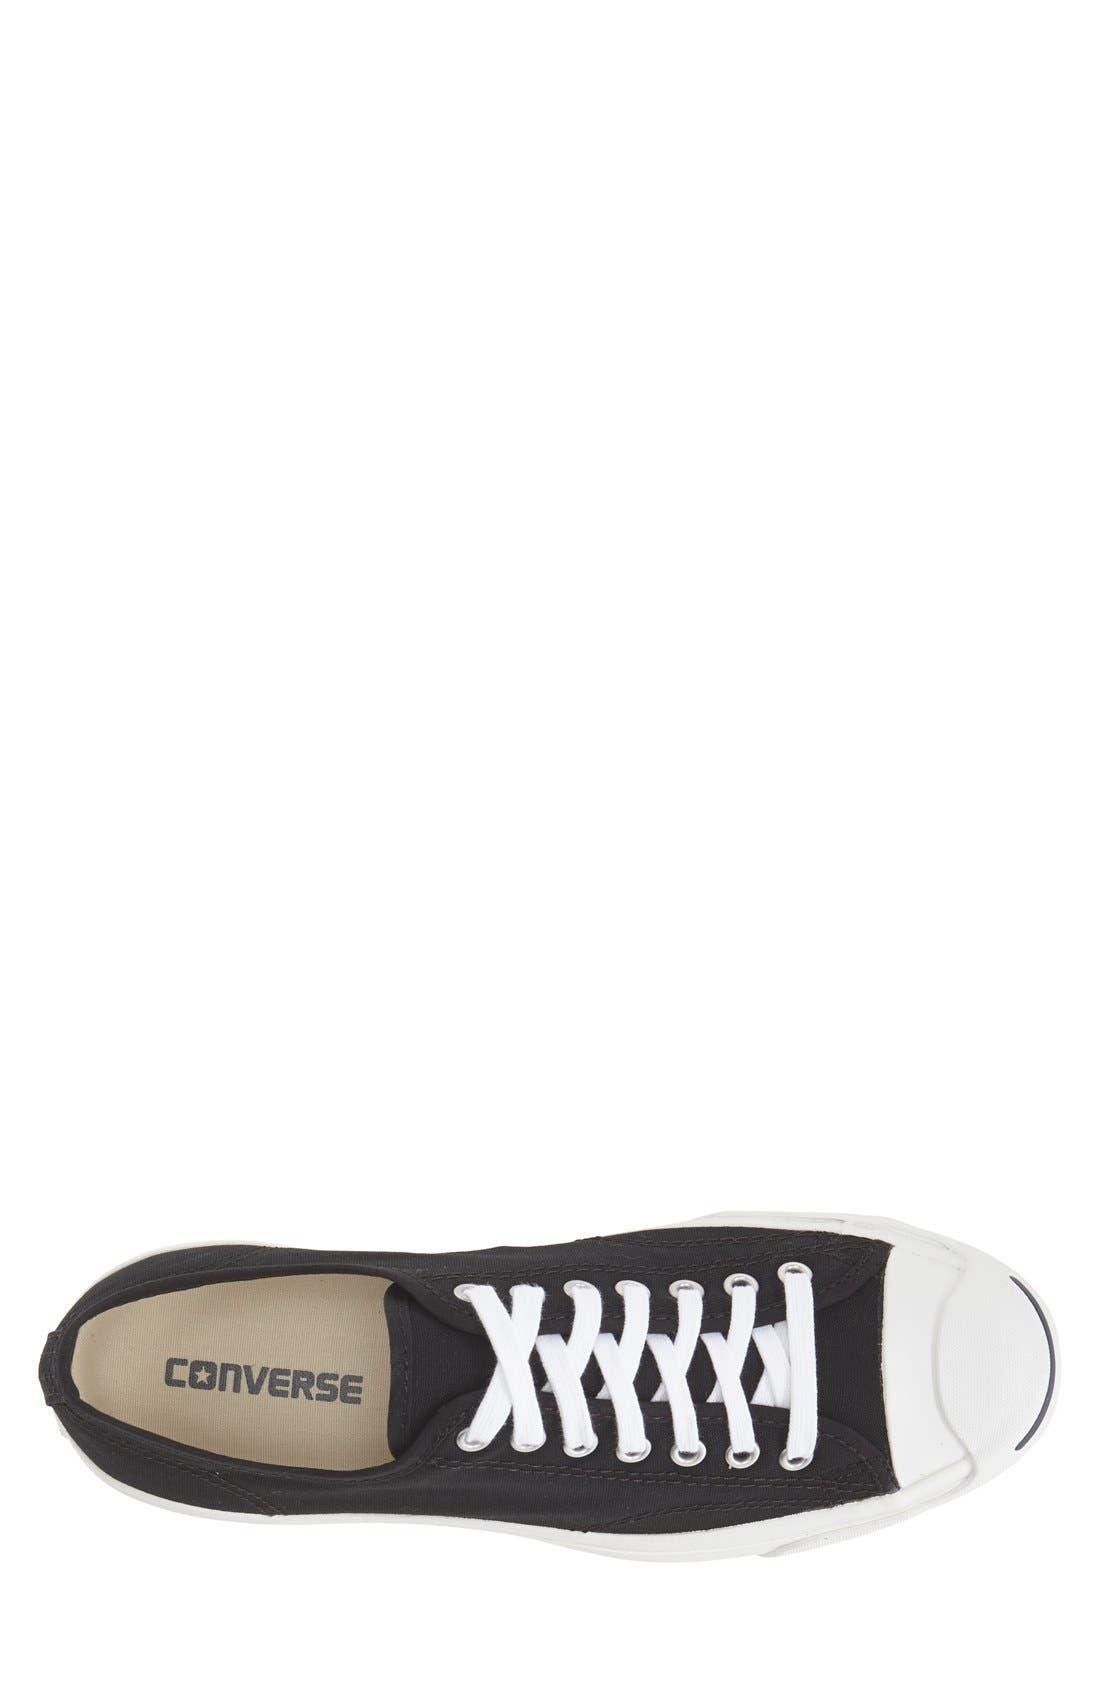 CONVERSE,                             'Jack Purcell' Sneaker,                             Alternate thumbnail 2, color,                             BLACK